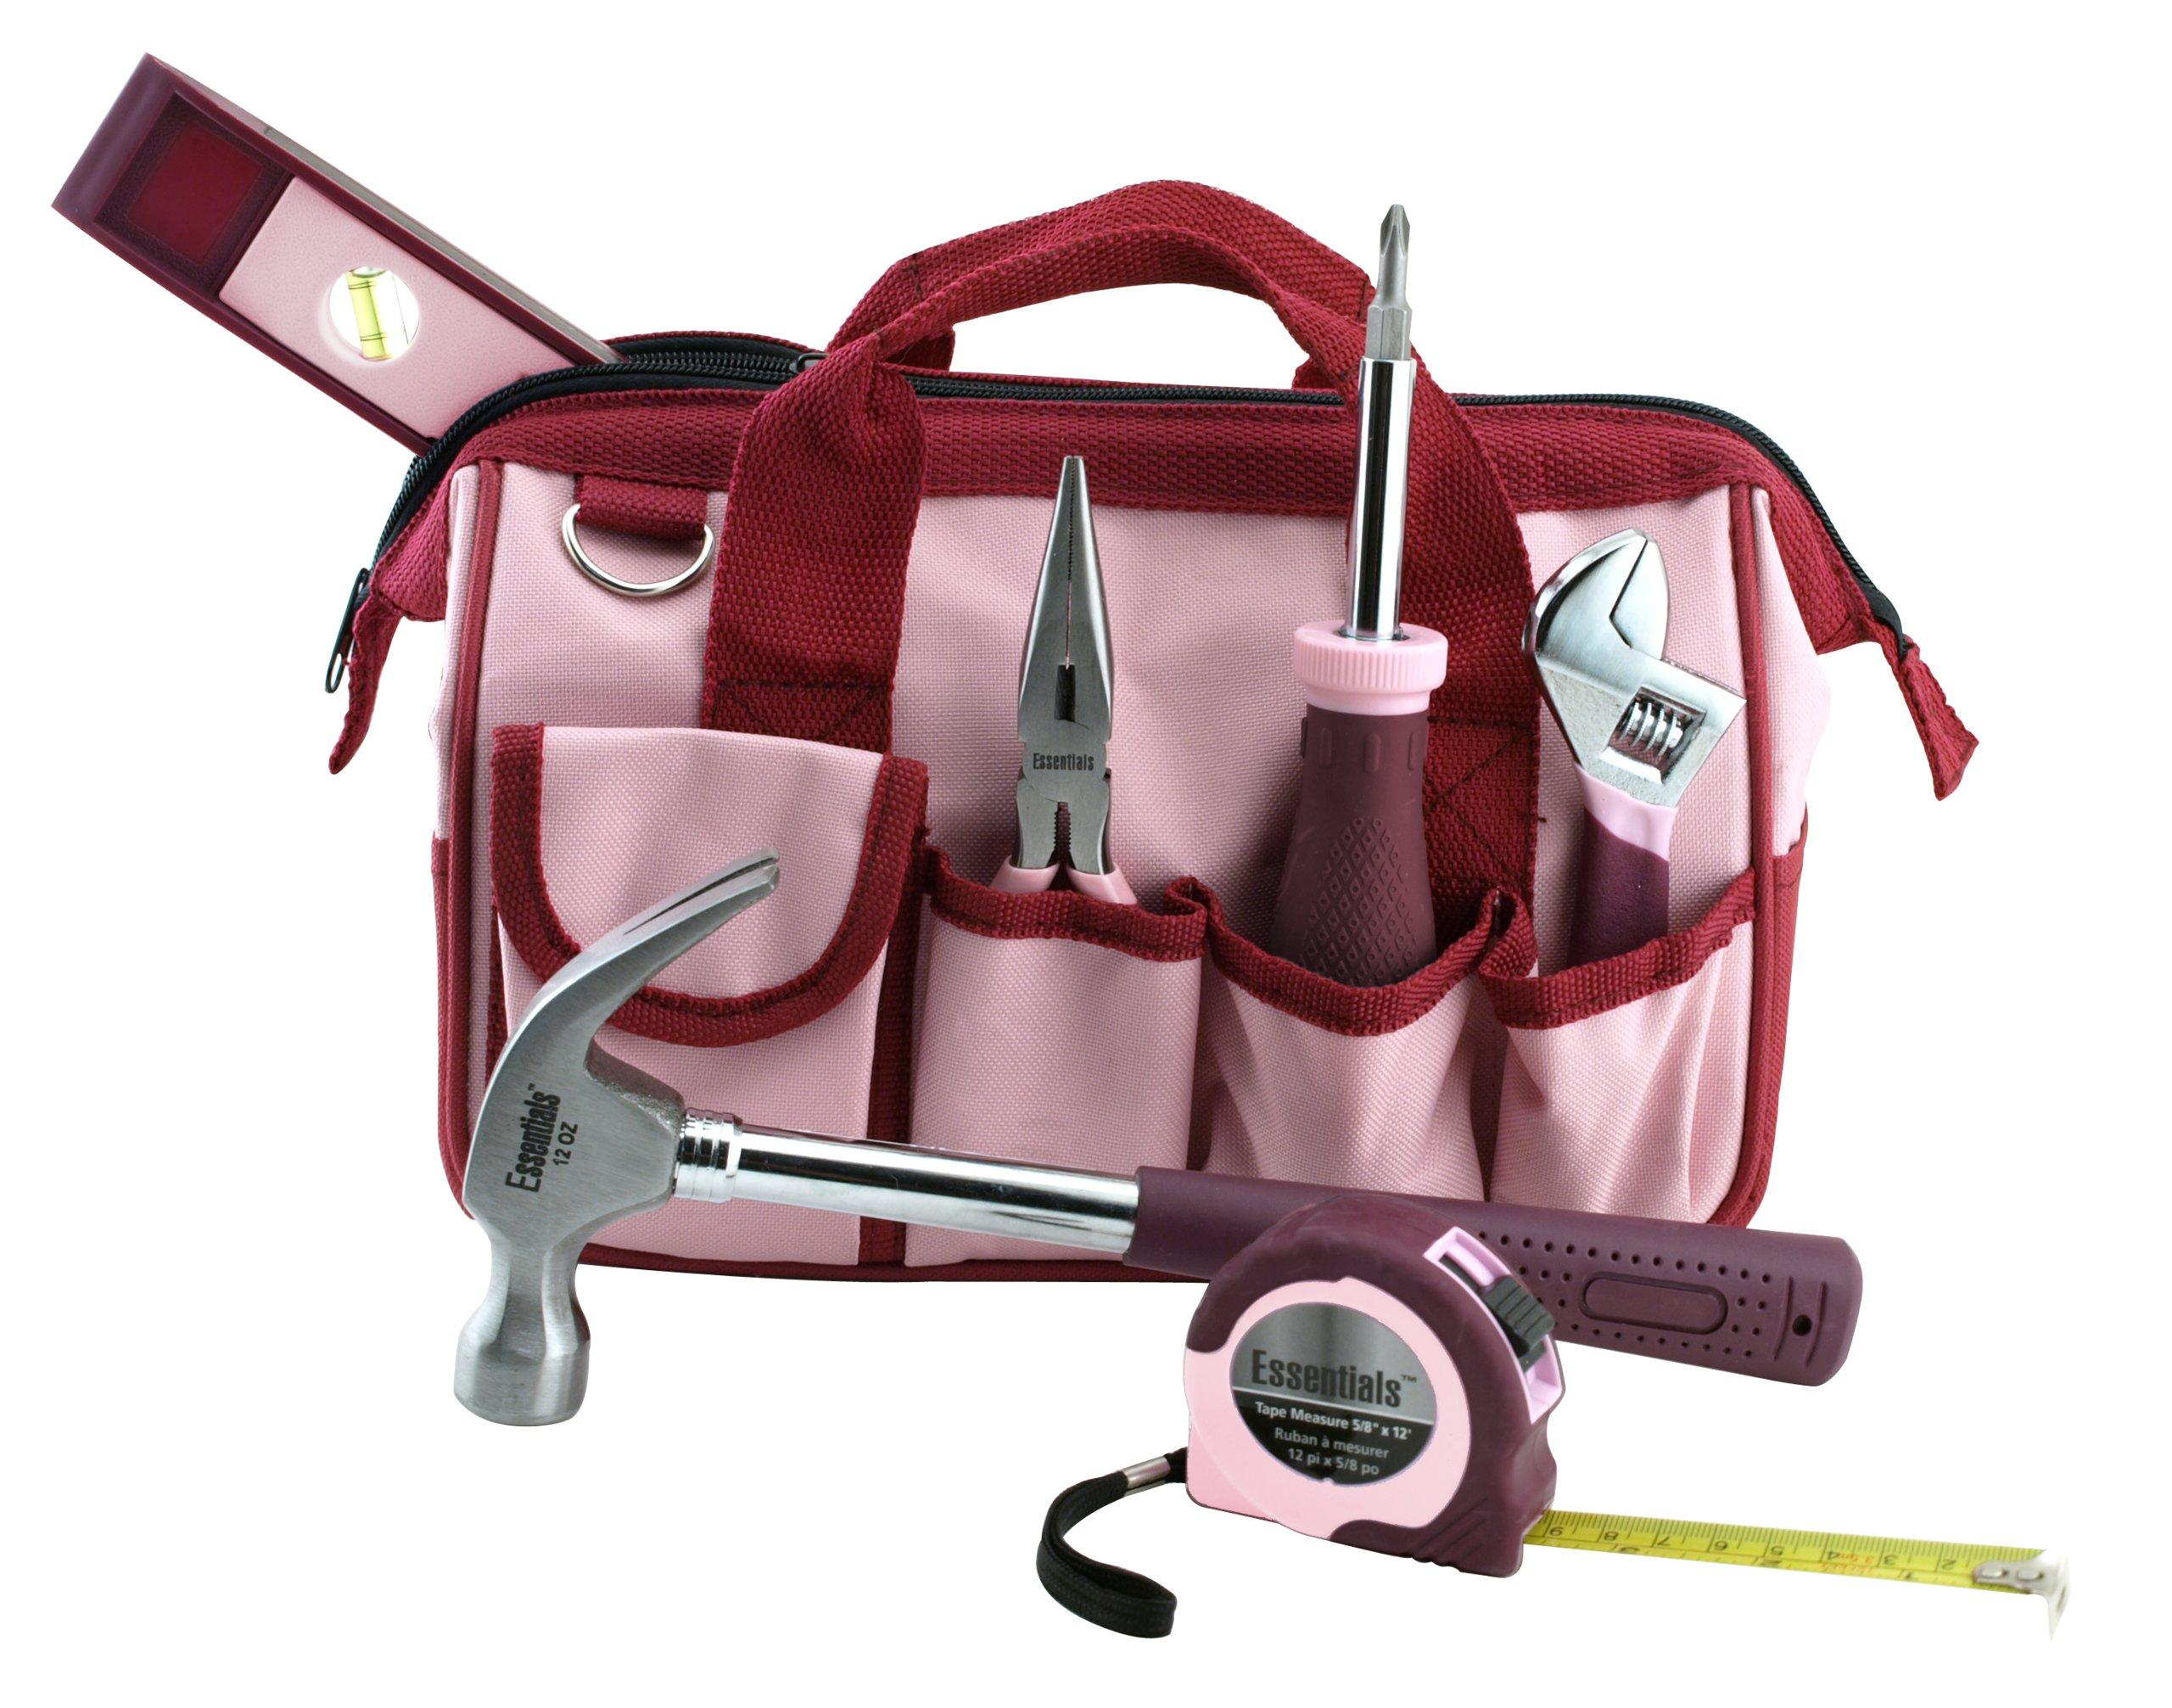 Great Neck 6709 Essentials Around The House Tool Set, Pink, 7-Piece